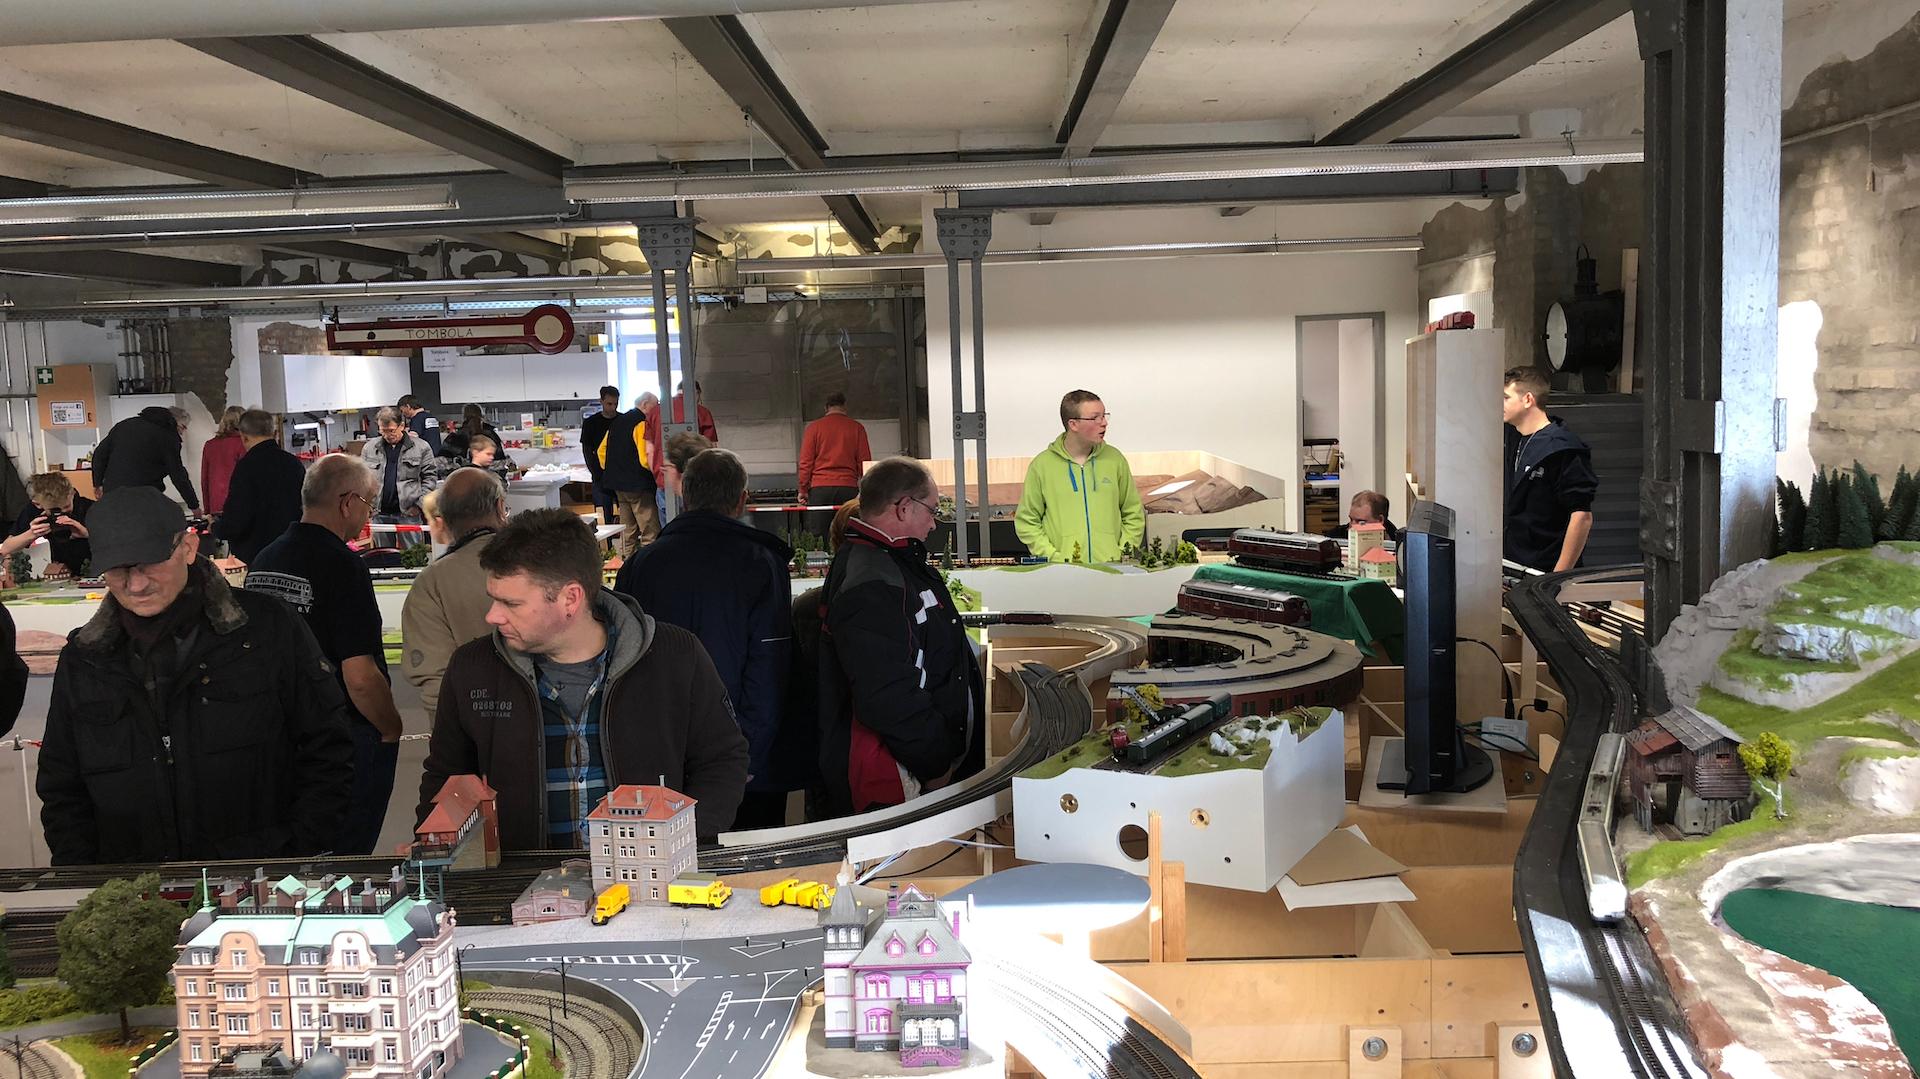 18_02_24_Schautag-Eisenbahnfreunde-Hameln_015